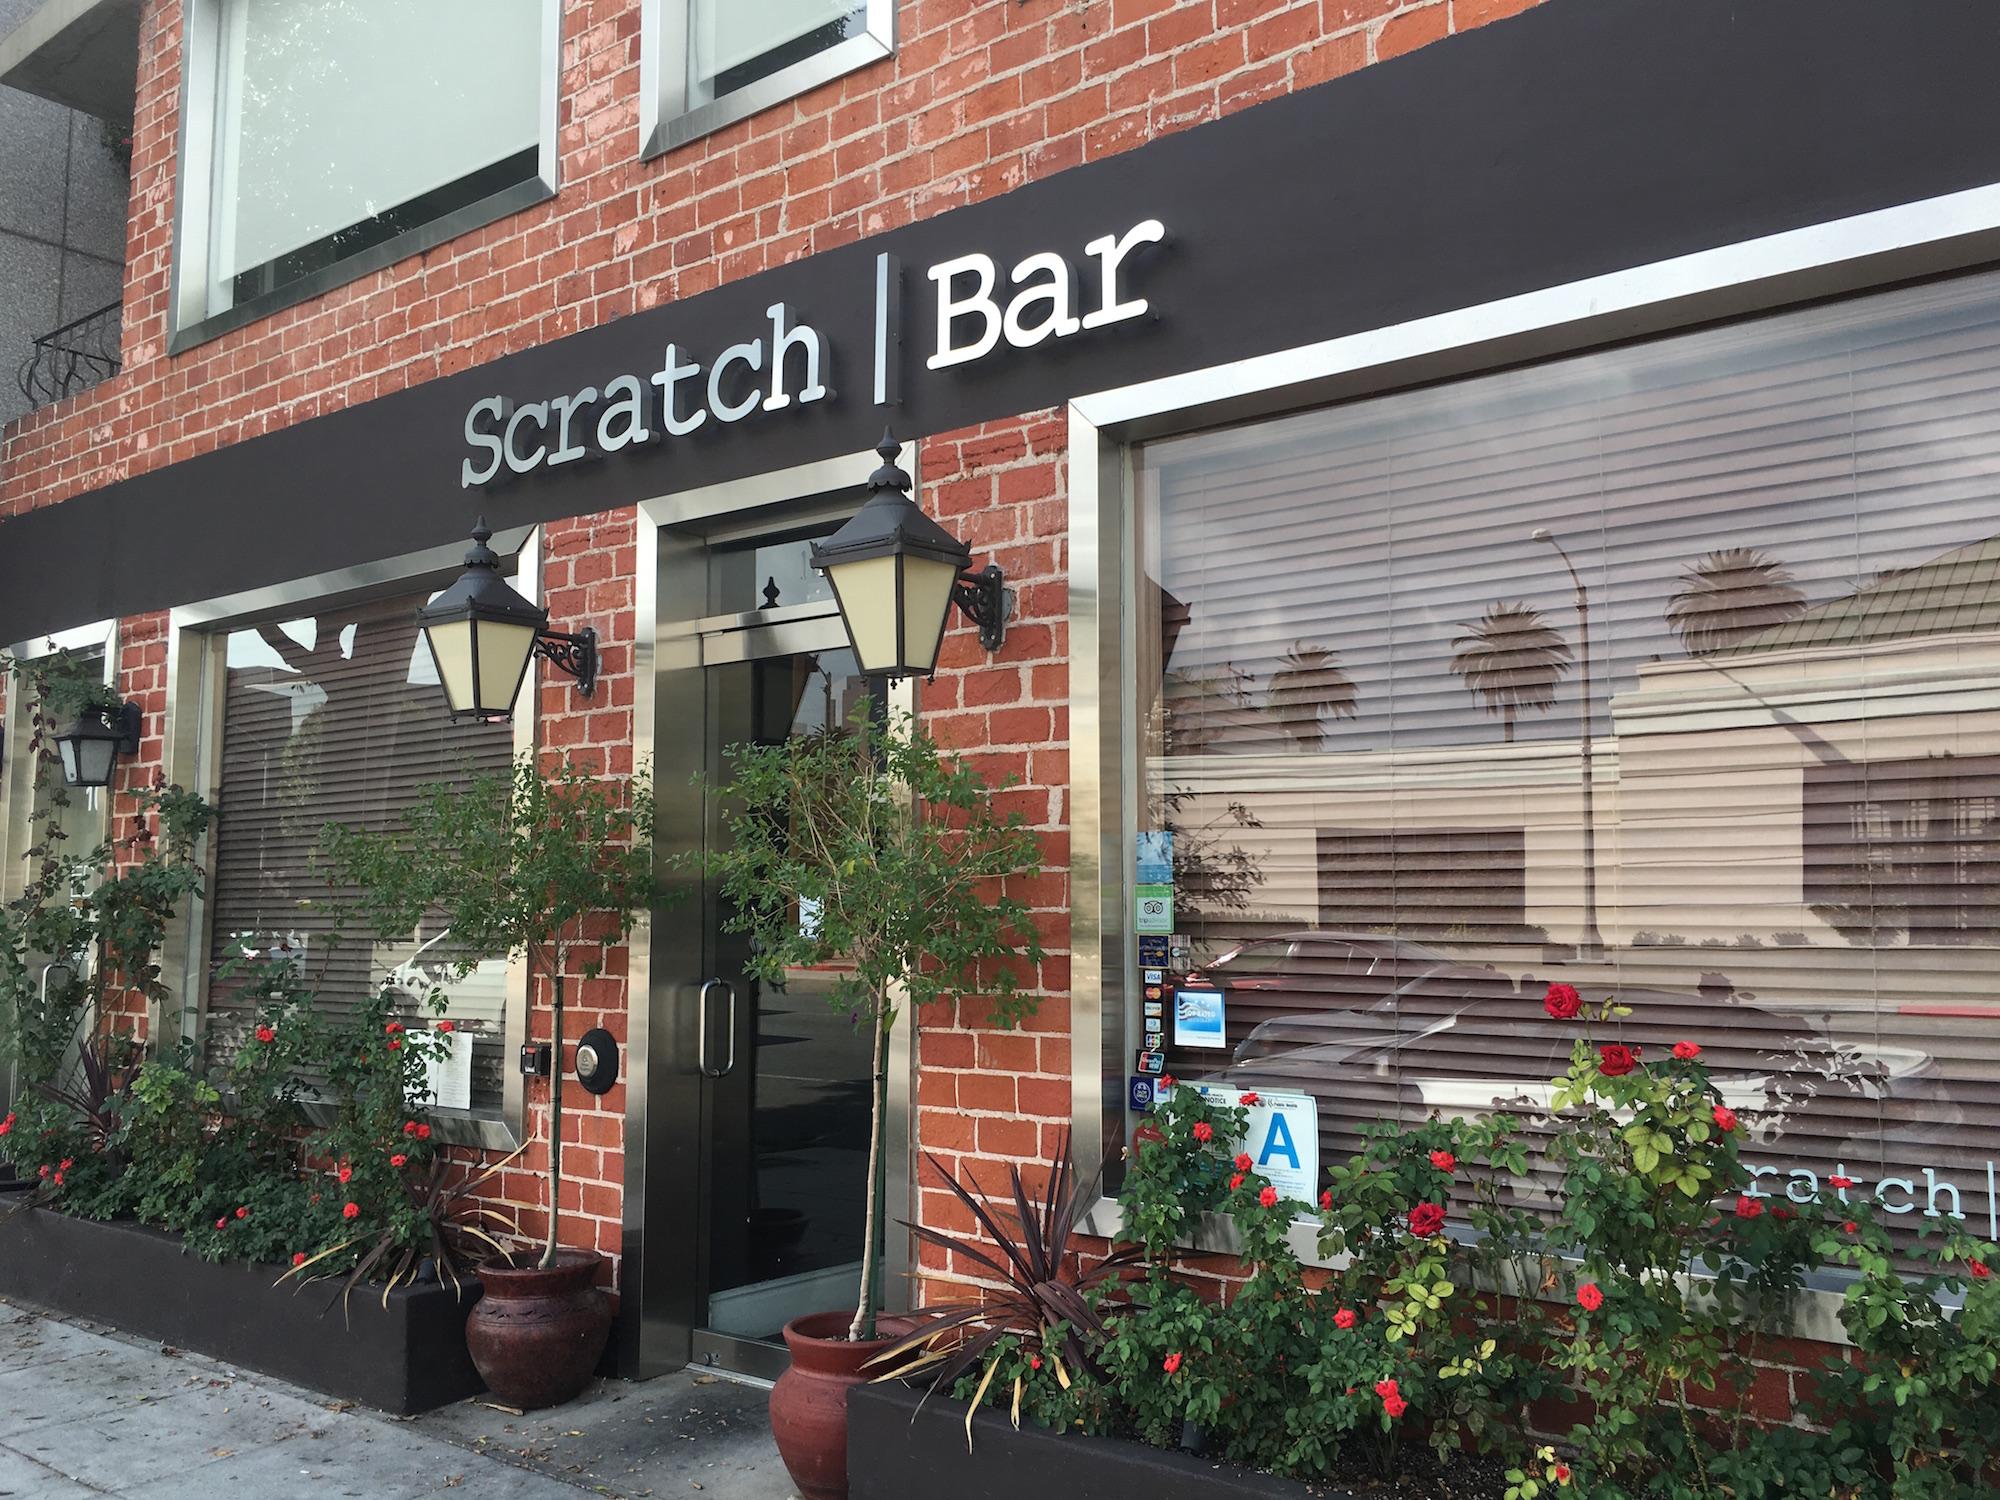 Scratch Bar, Beverly Hills as of October 19, 2015